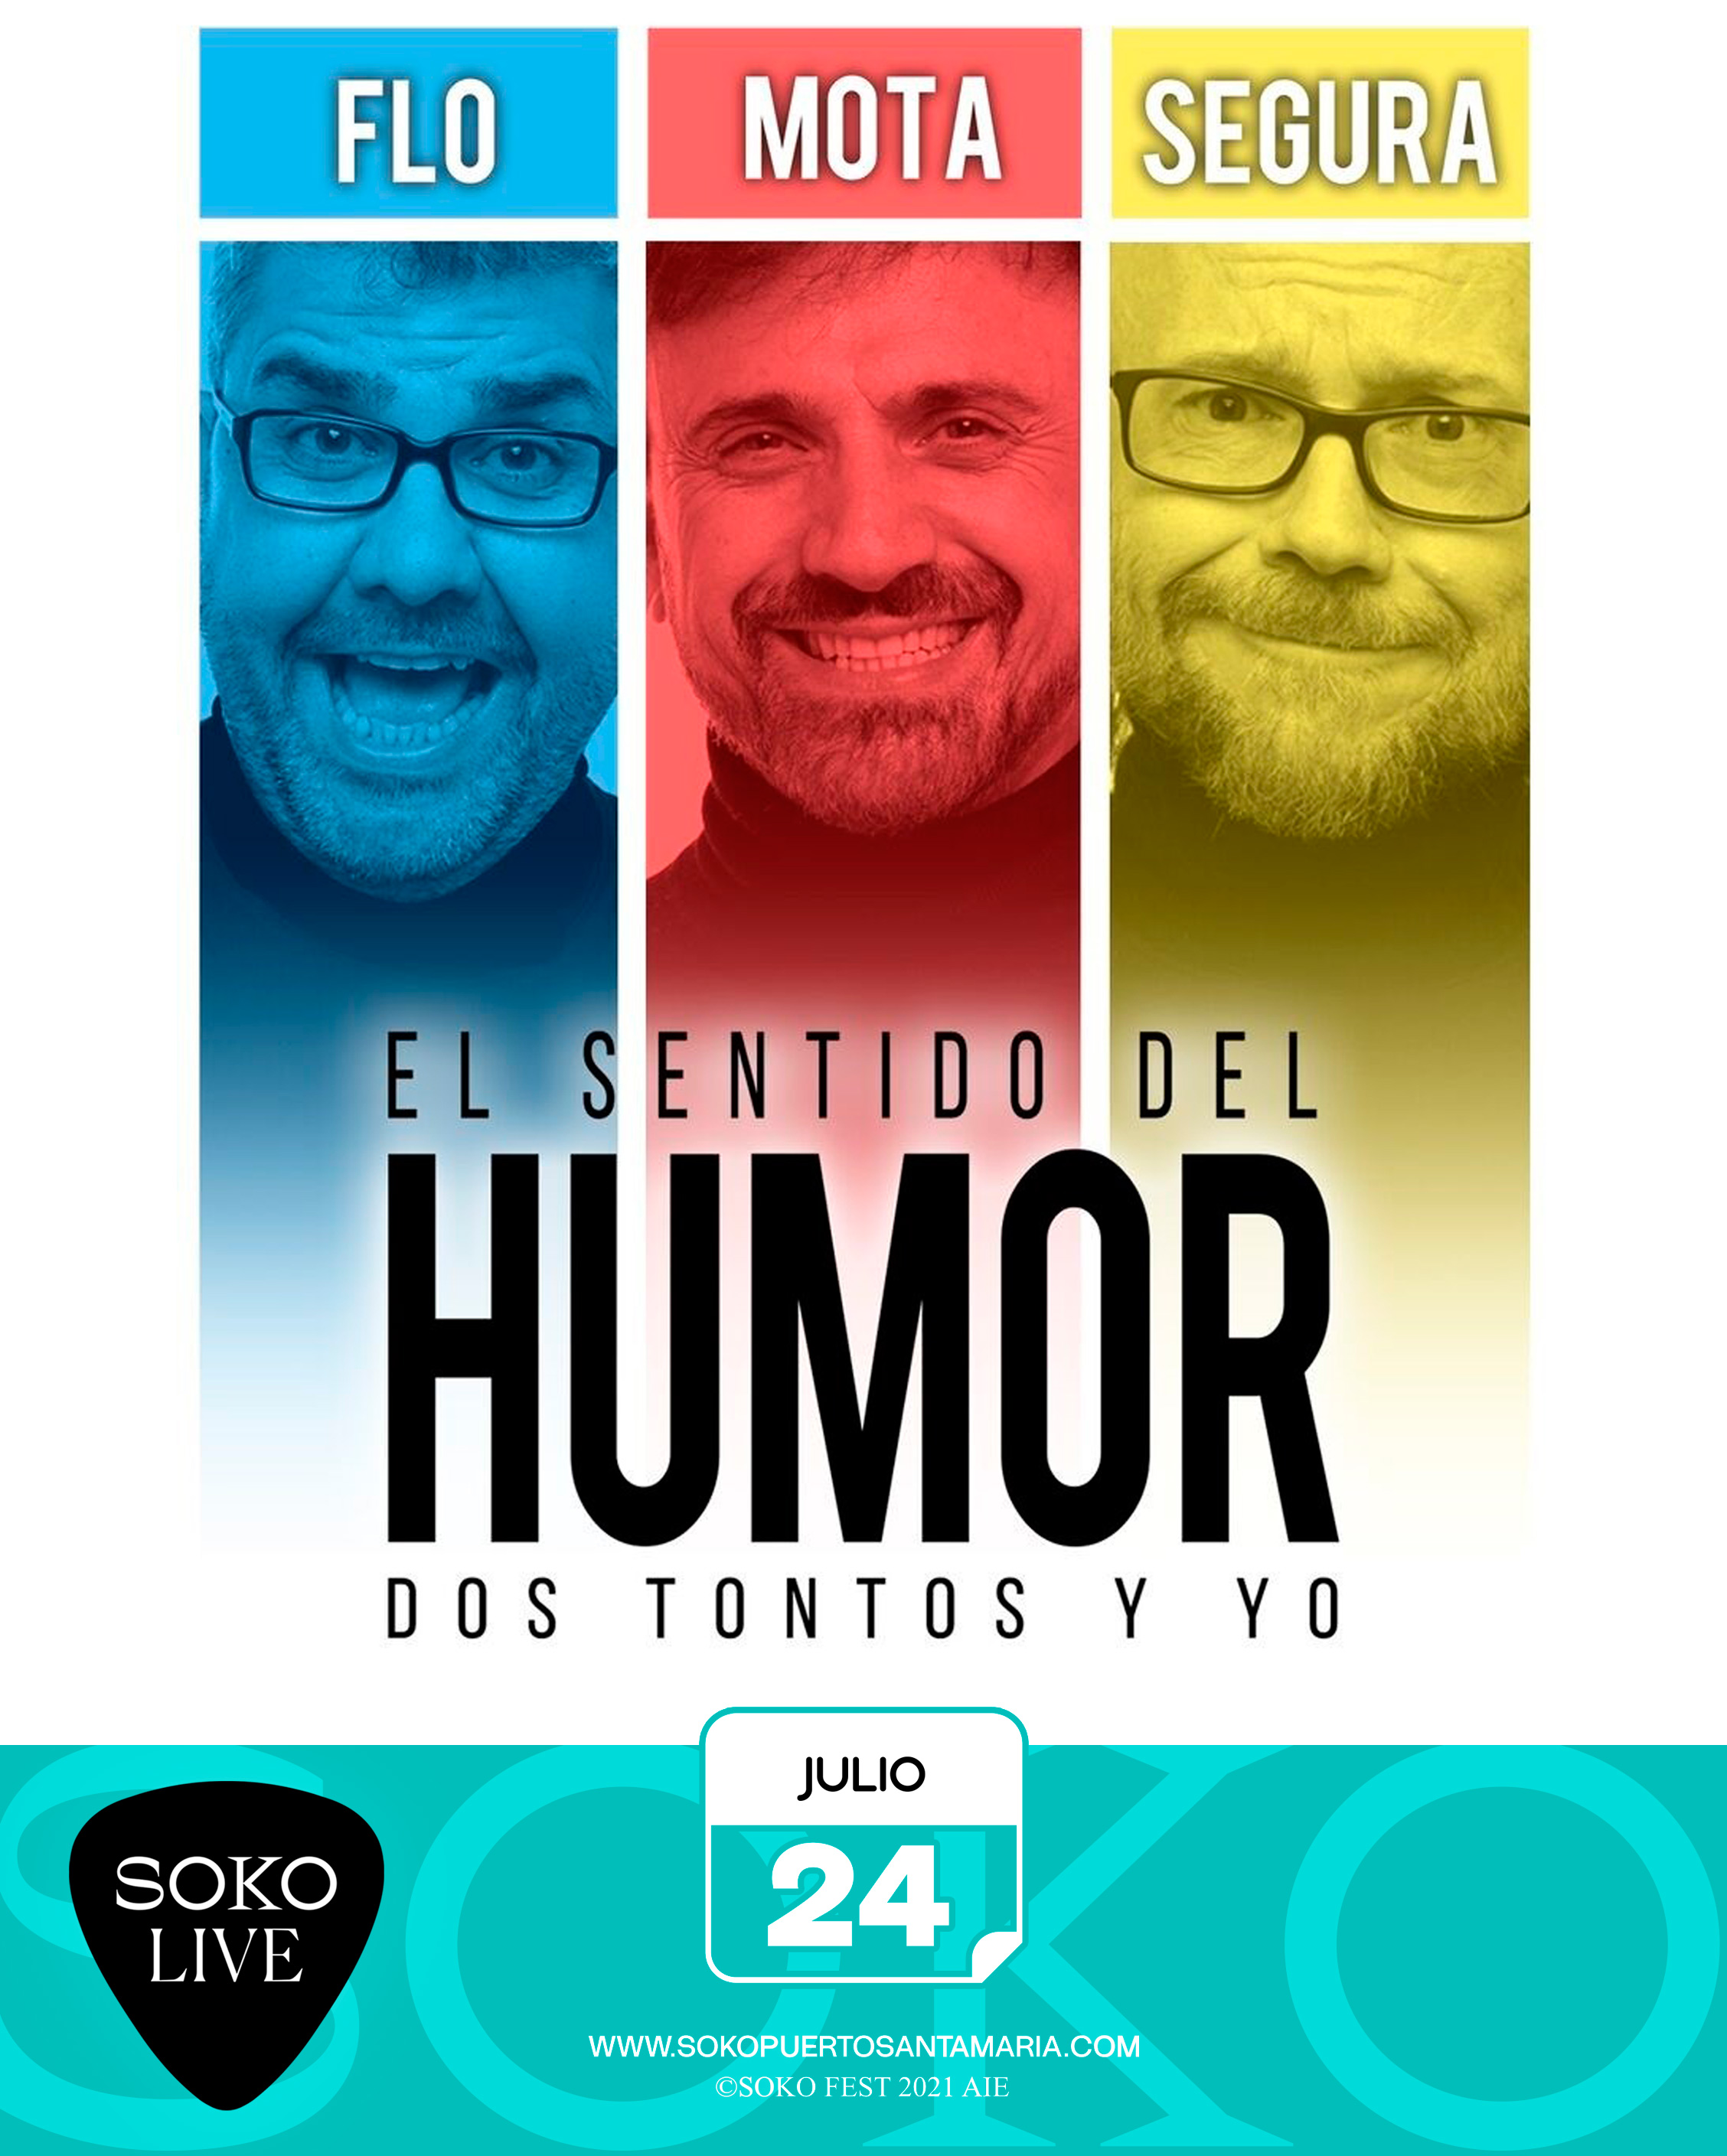 el-sentido-del-humor-soko-fest-sabado-24-julio-6076b68b8db93.jpeg